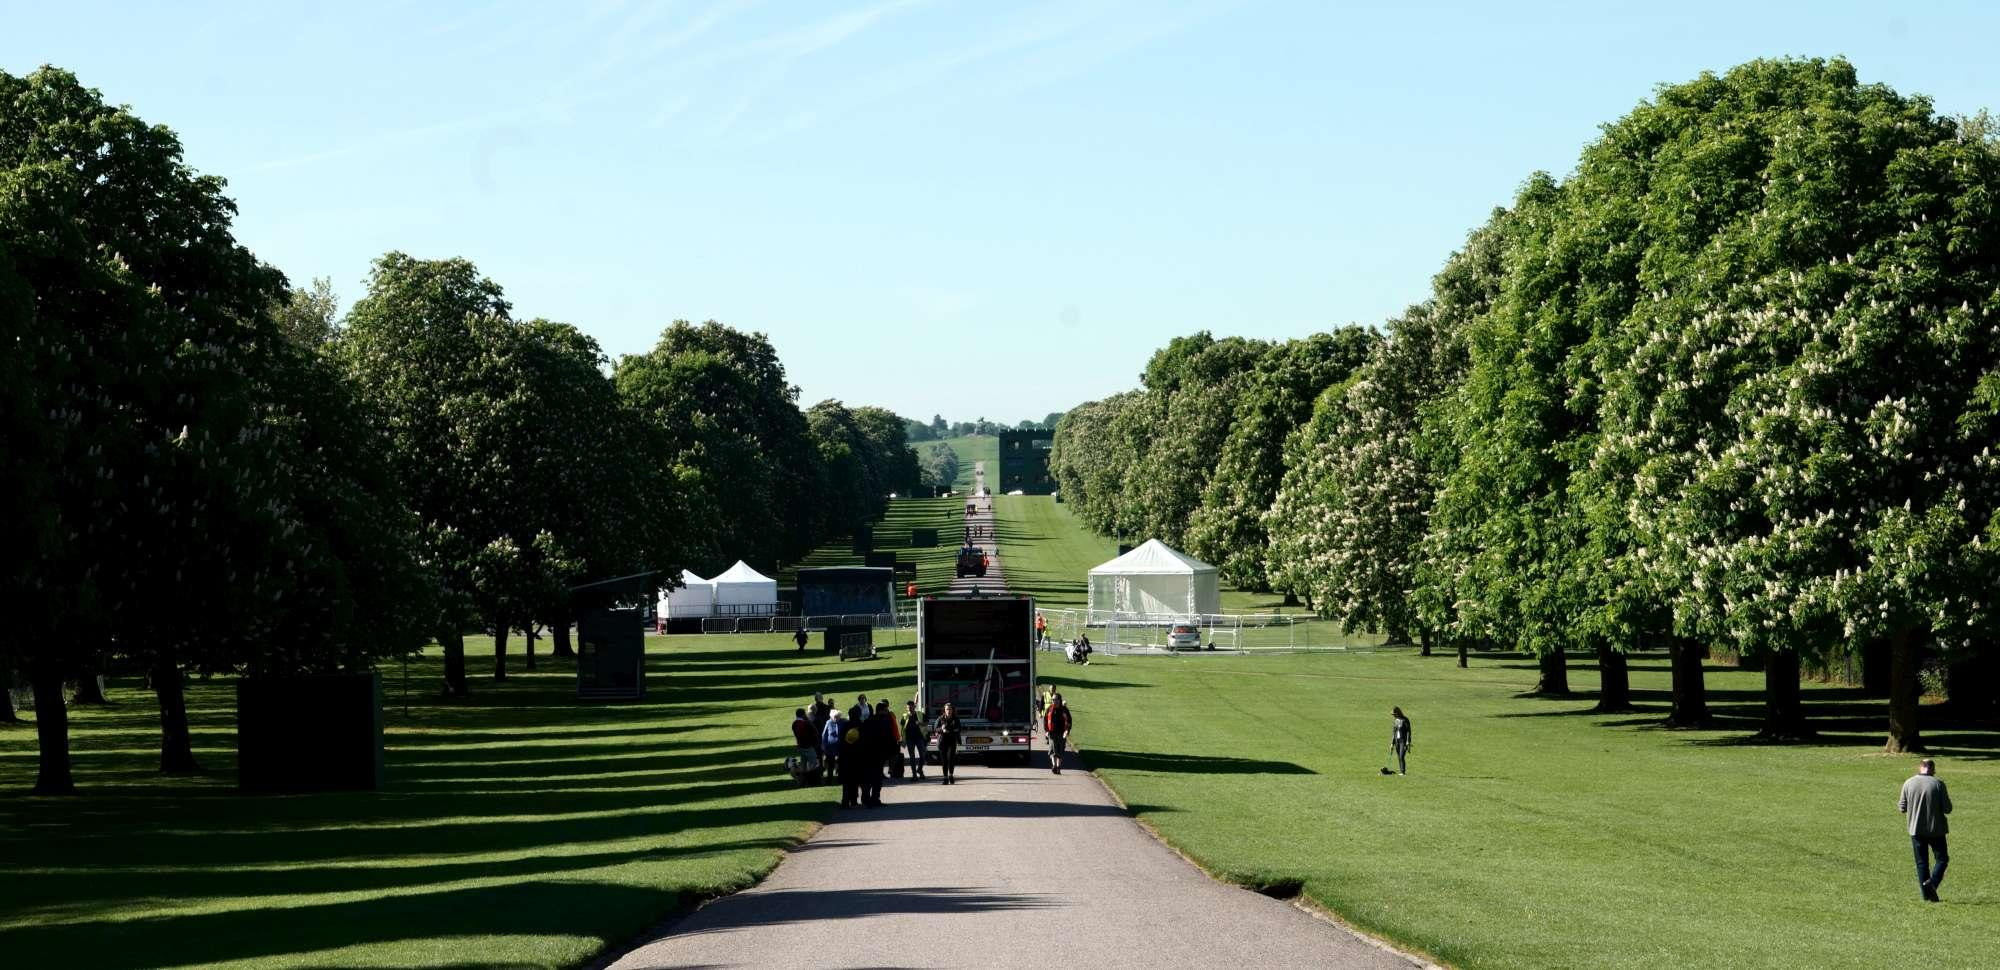 Nozze Harry-Meghan, guarda i preparativi al castello di Windsor